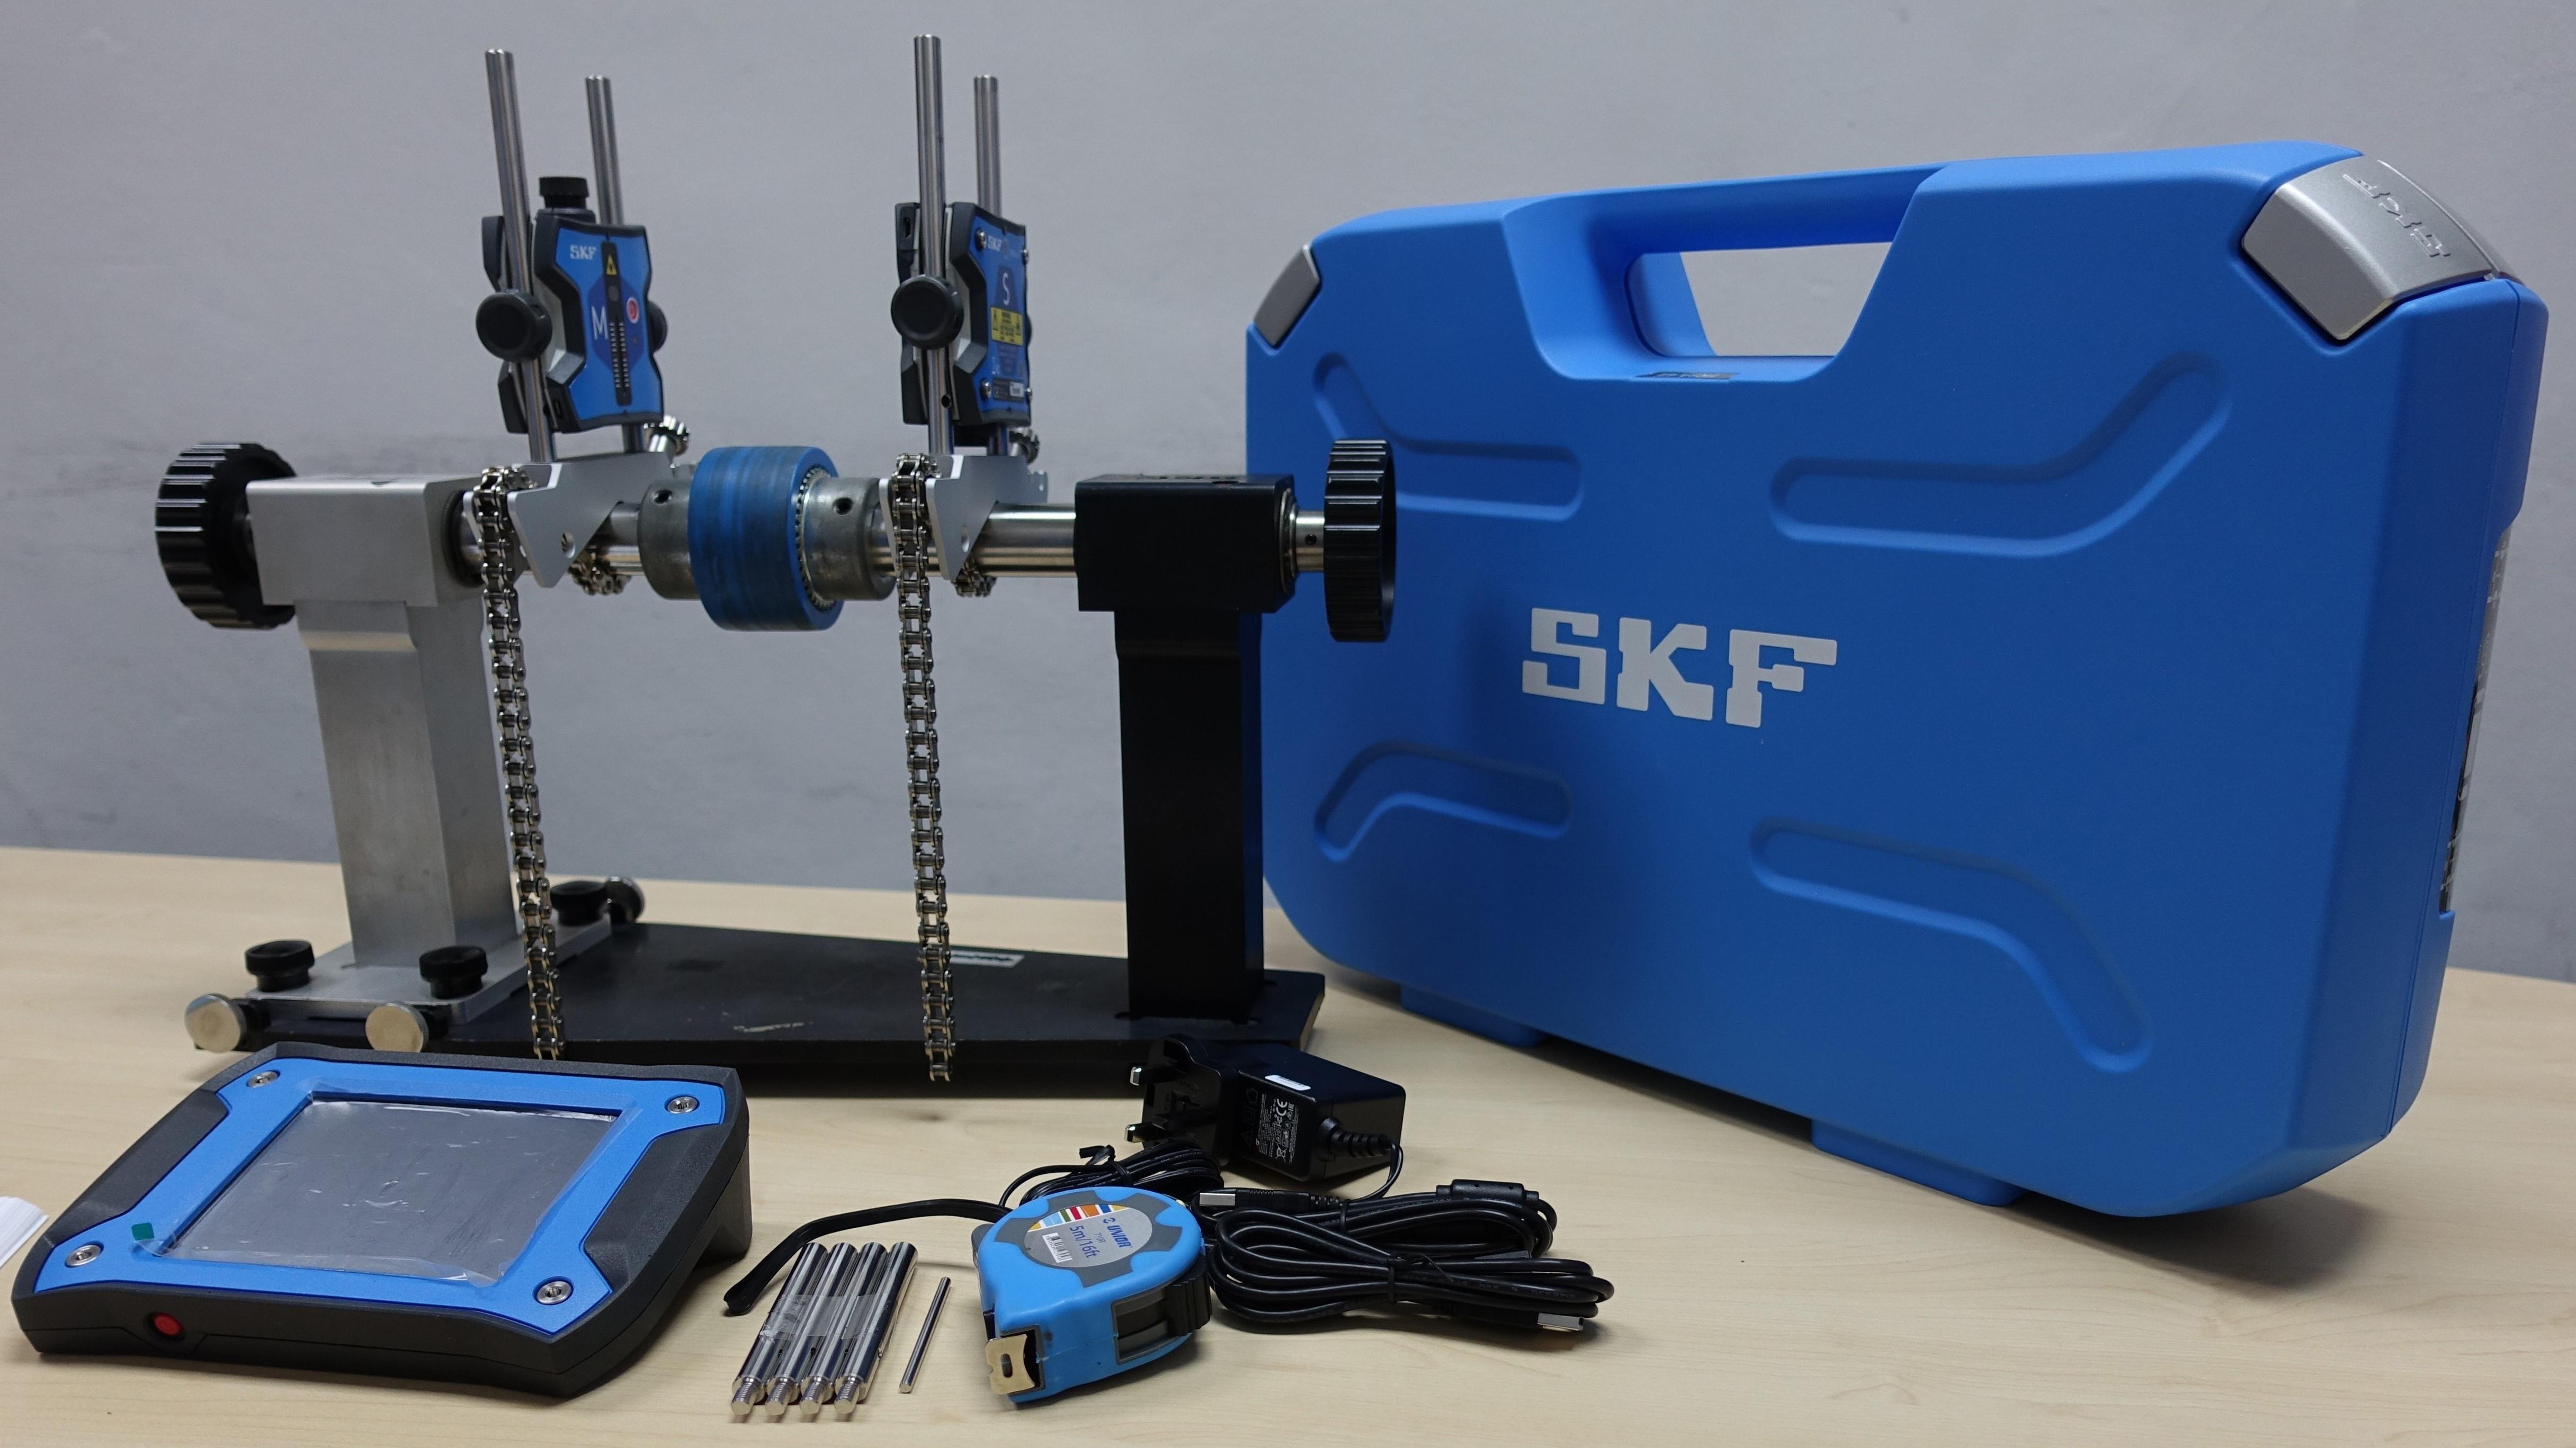 Image showing the SKF shaft alignment tksa 41 kit